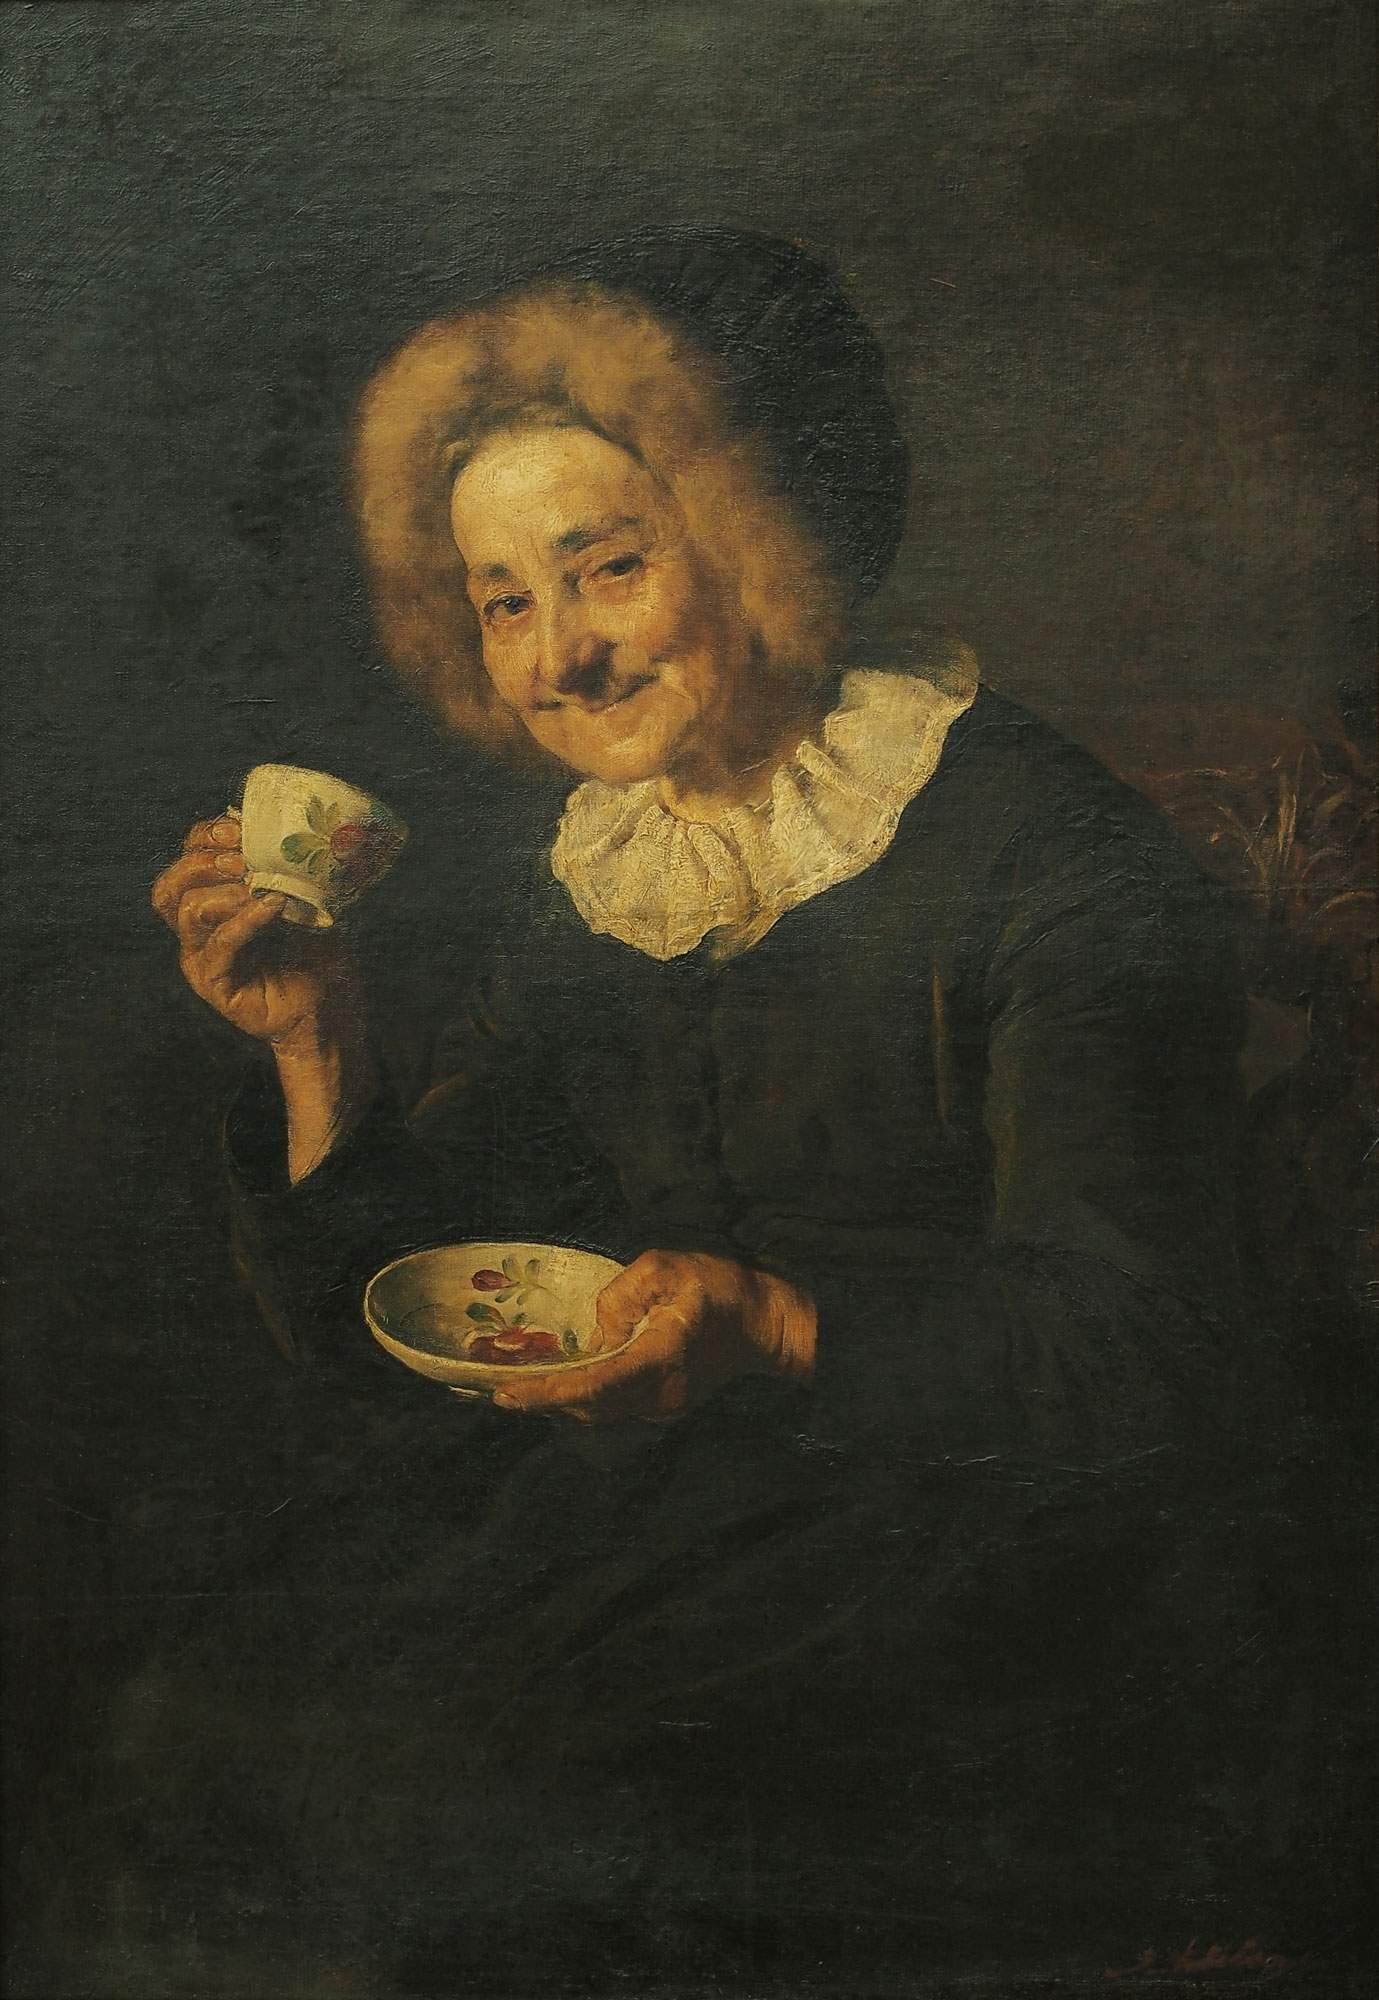 coffee-drinker-ivana-kobilca-slovenian-art